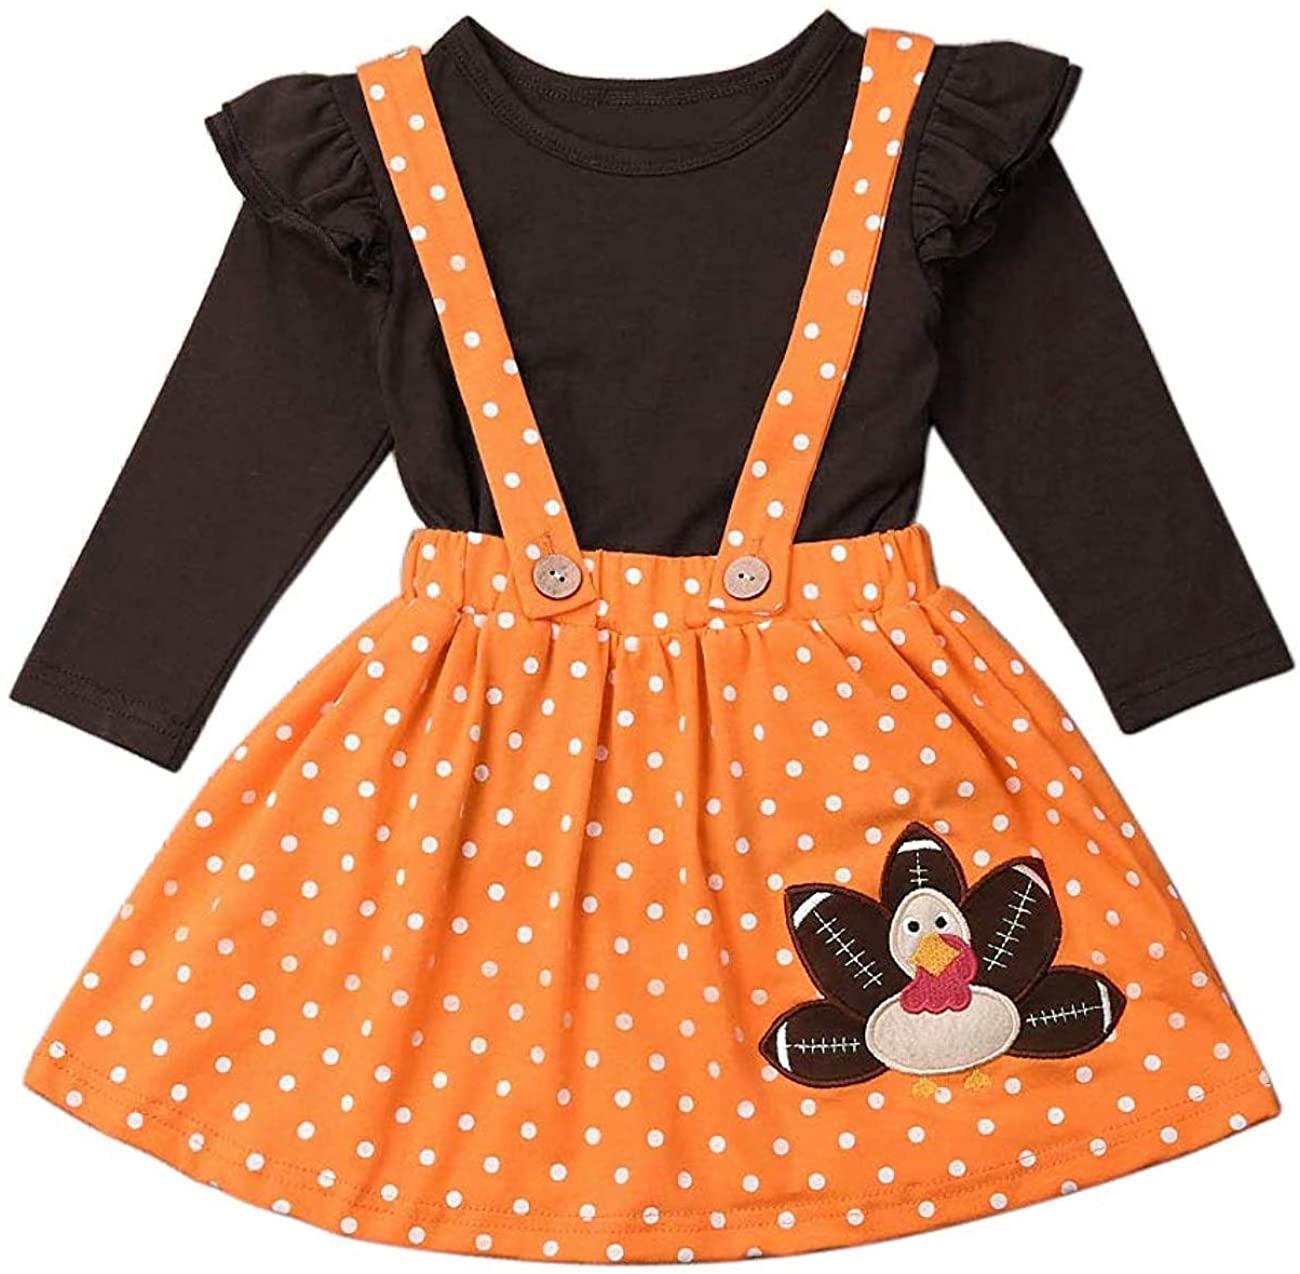 Toddler Girls Clothes Set Ruffle Top Shirts+Turkey Print Dot Suspender Skirt Thanskgiving Outfits Set